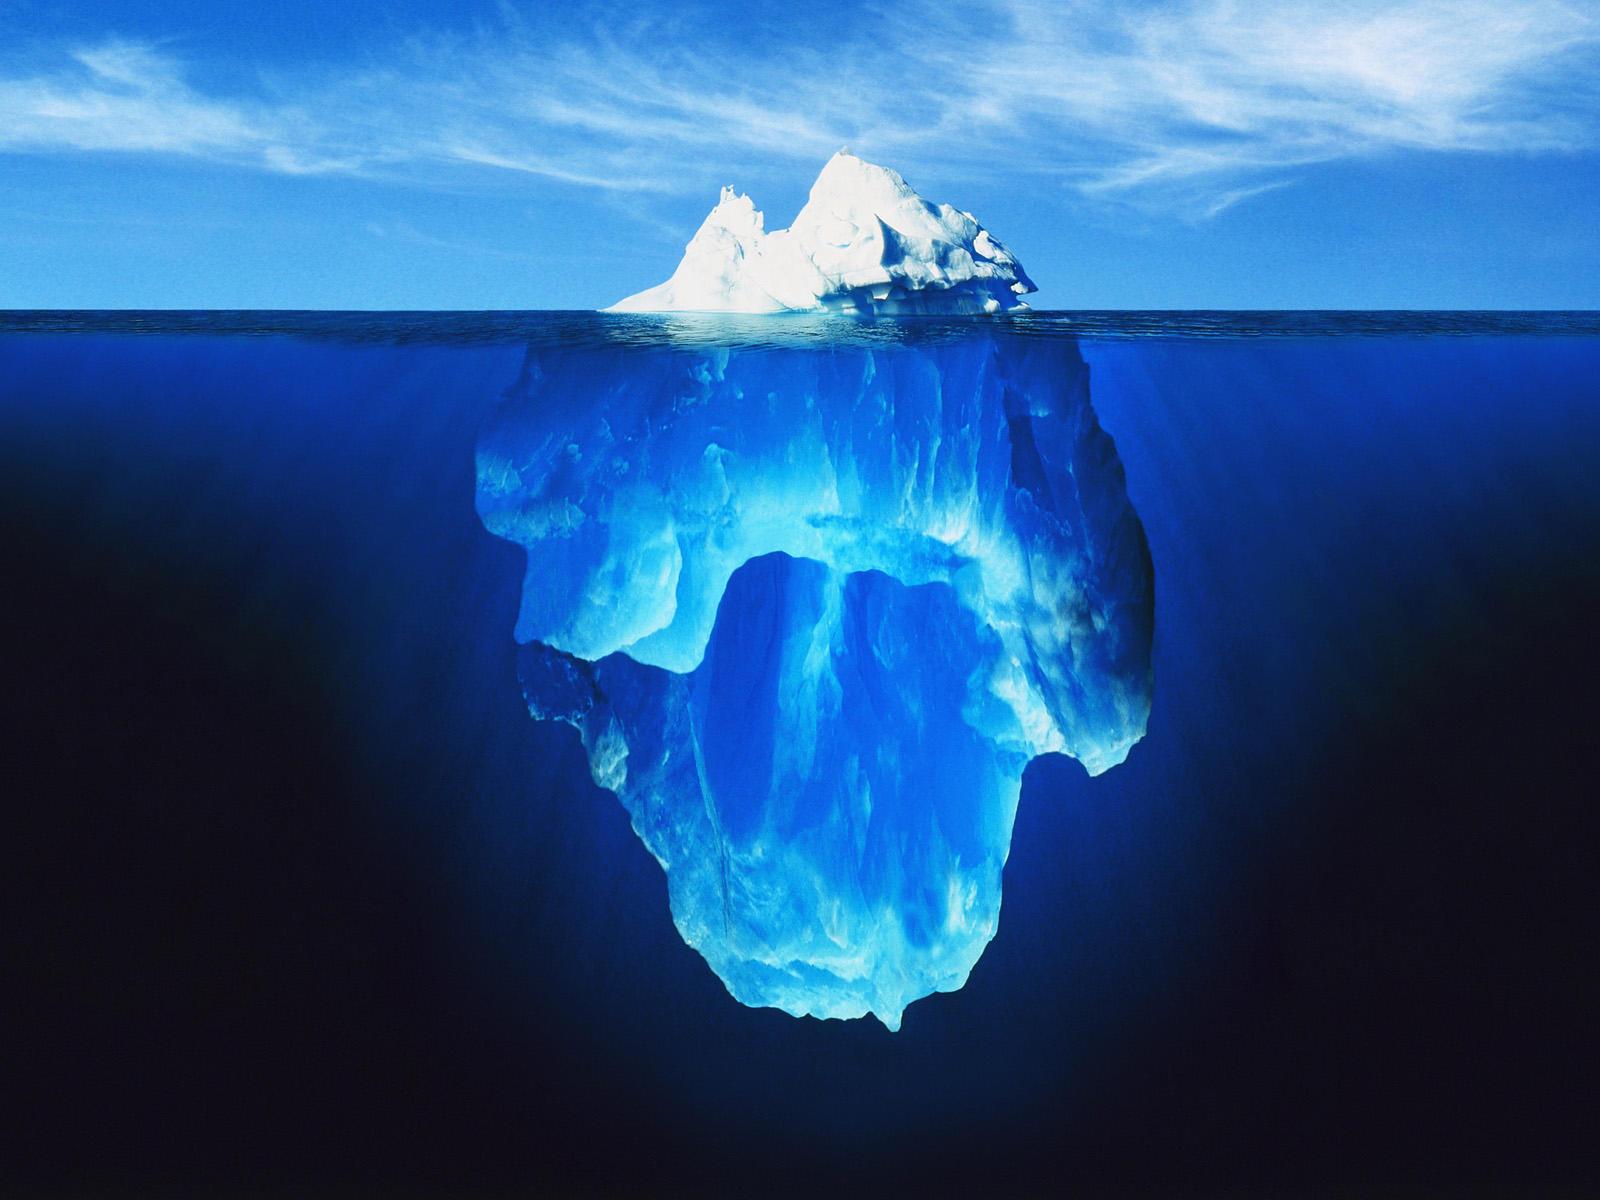 Titanic clipart Tip The Clipart Iceberg